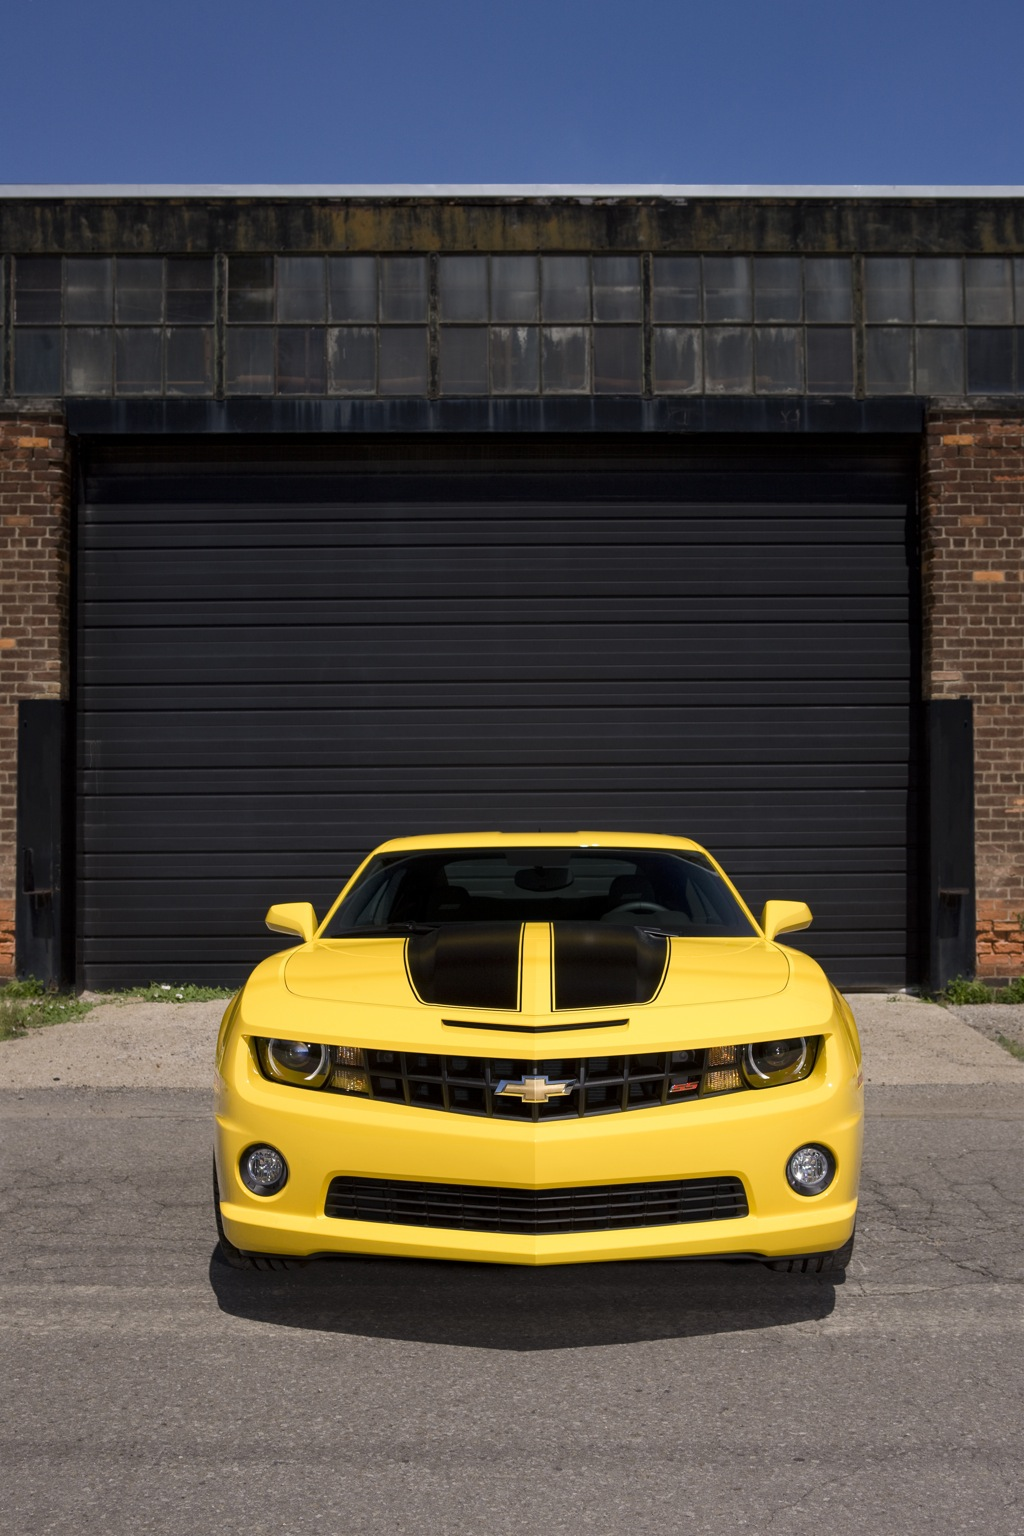 Chevy Camaro For Sale >> 2010 Chevrolet Camaro Transformers Special Edition - autoevolution